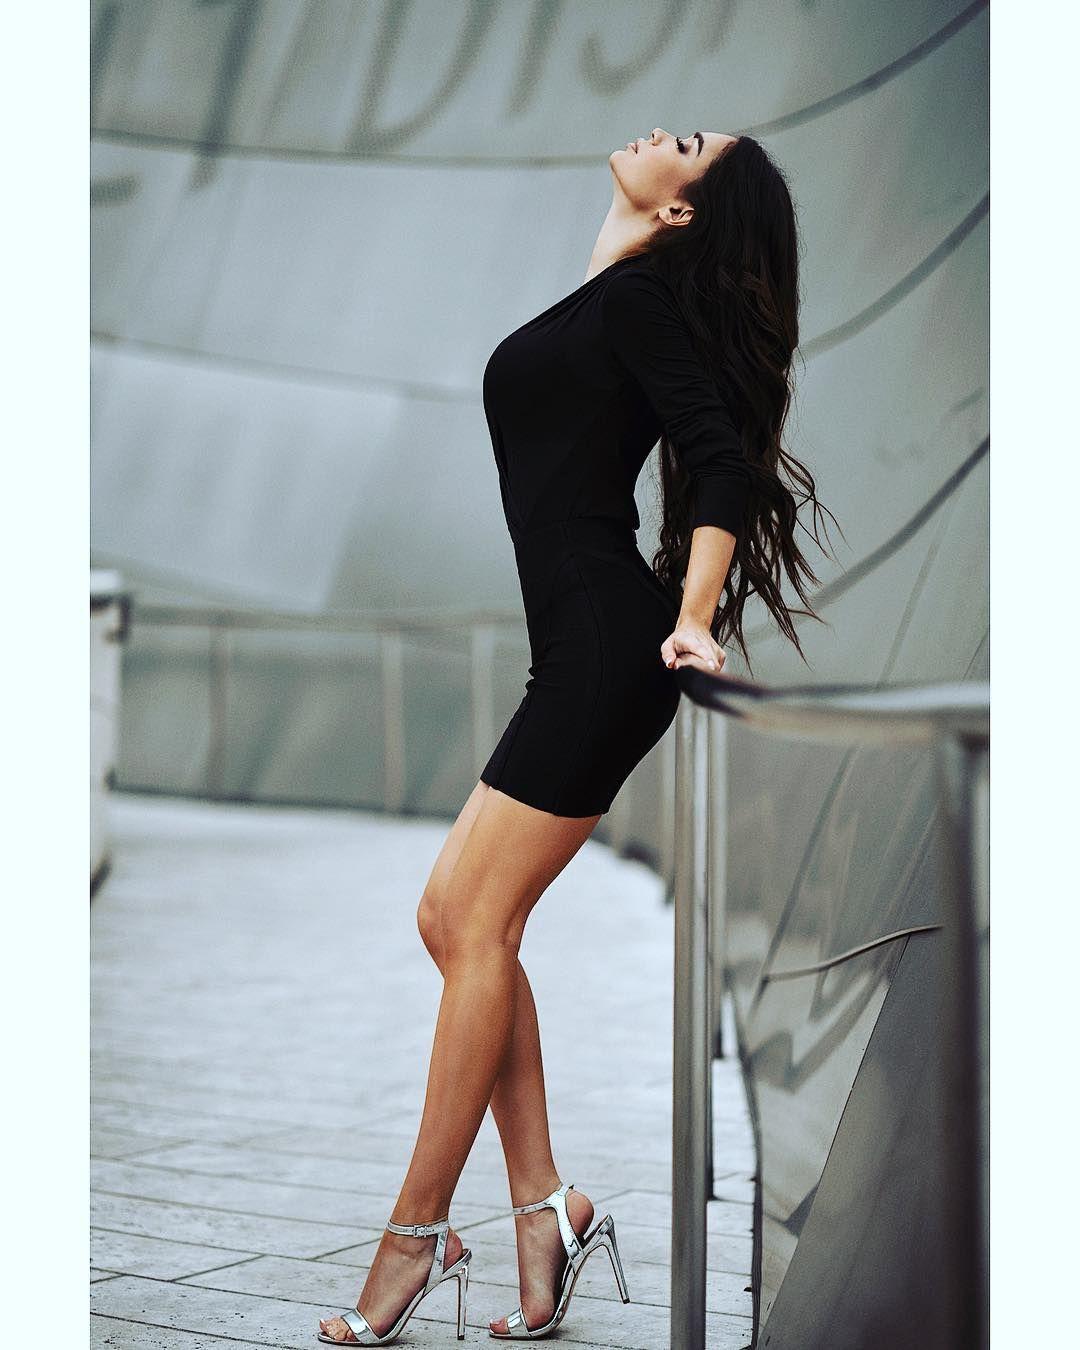 Snapchat Ekaterina Zueva nude (71 foto and video), Topless, Sideboobs, Instagram, cleavage 2017